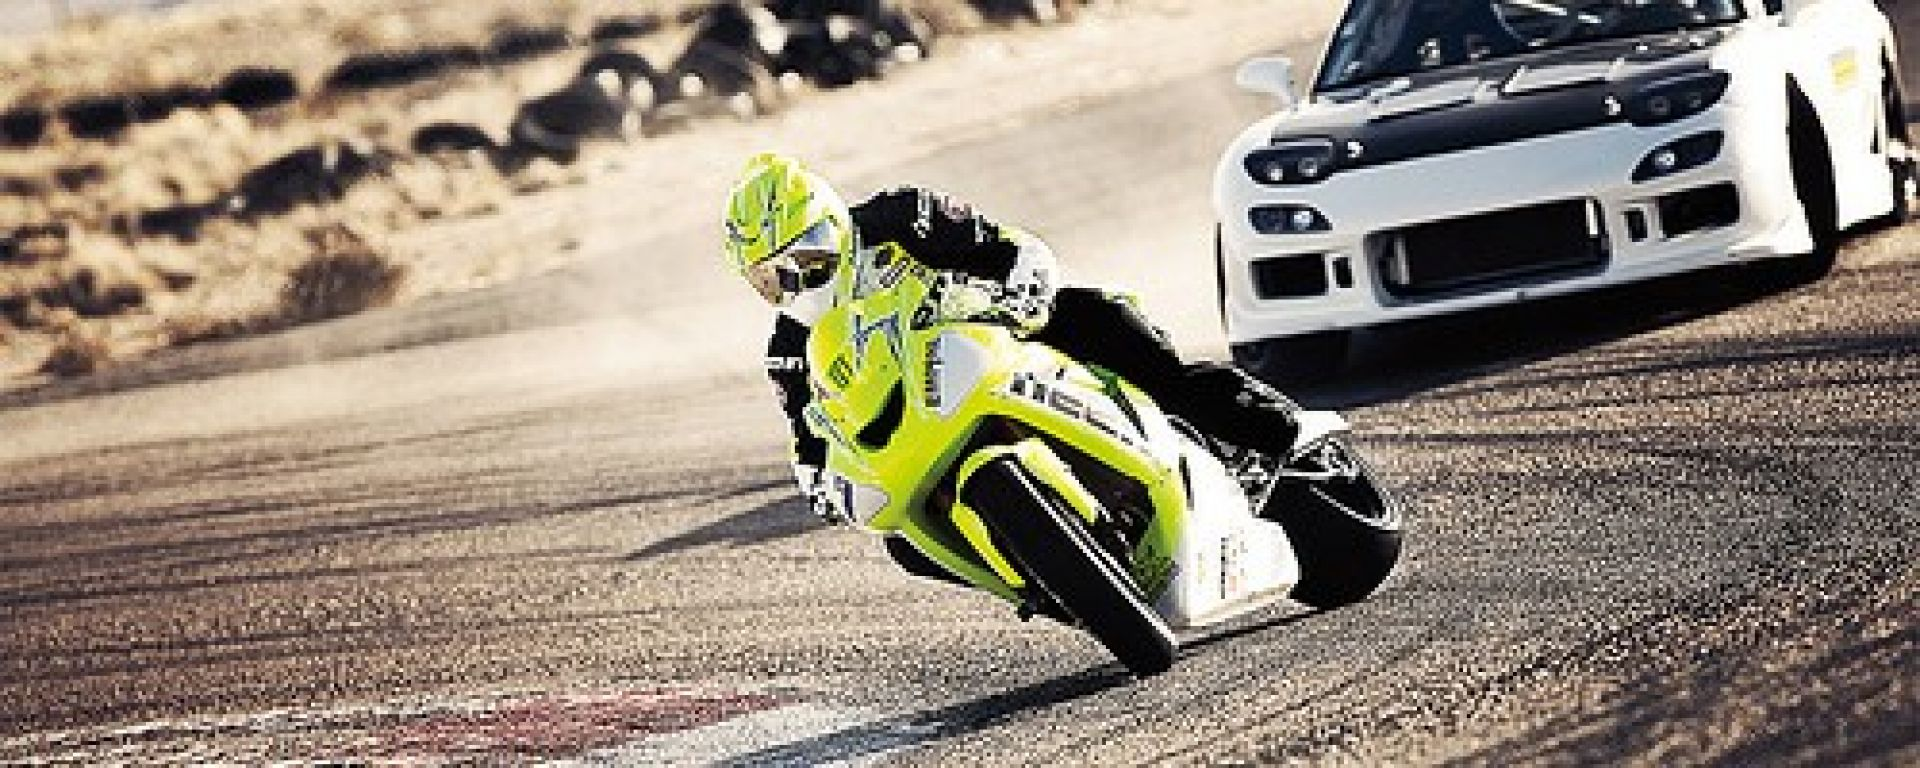 Drifting: moto sfida auto